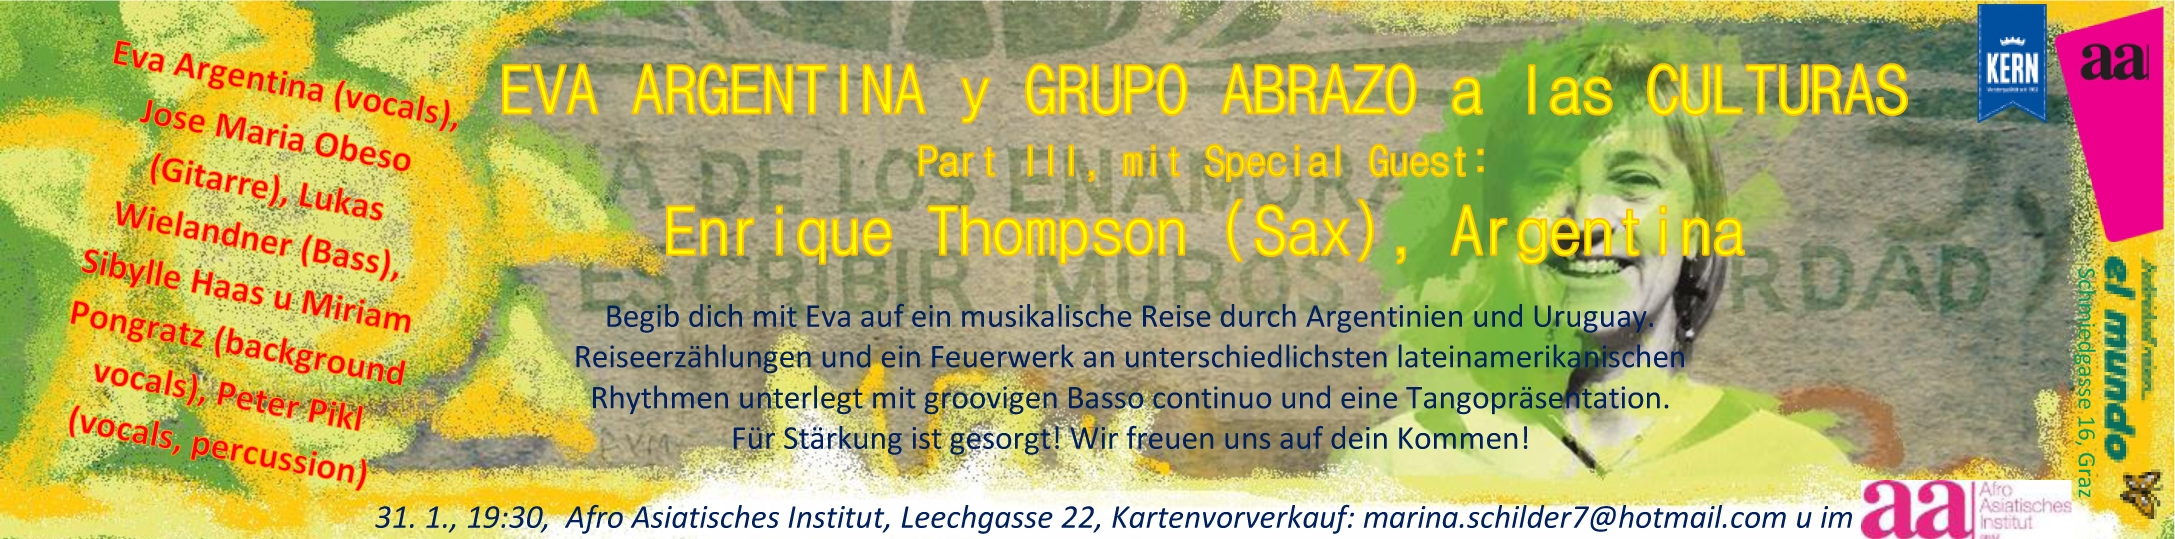 Konzert & Tangopräsentation